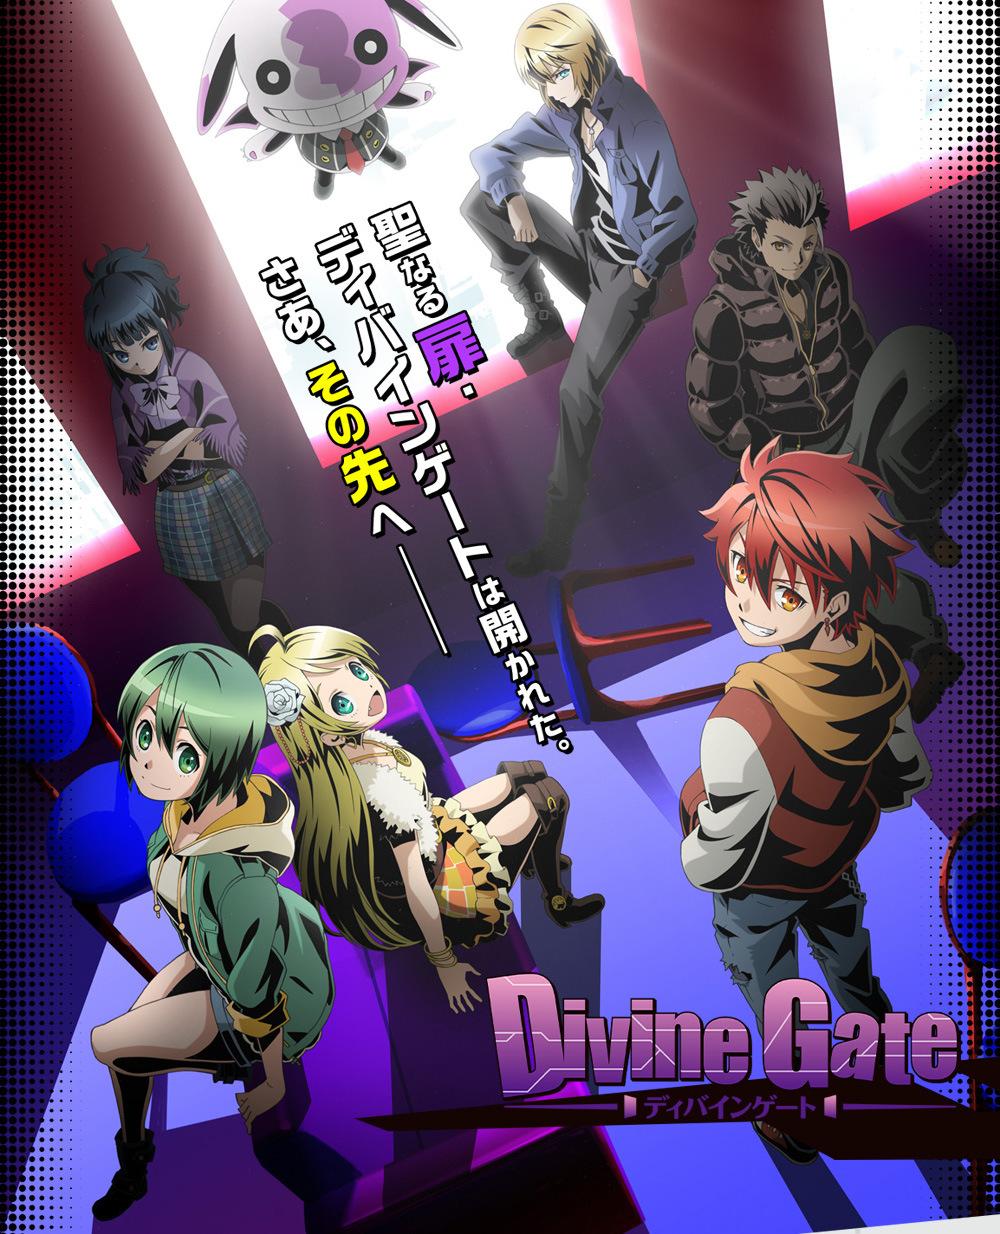 Smartphone Game Divine Gate Gets TV Anime Adaptation Slated for January